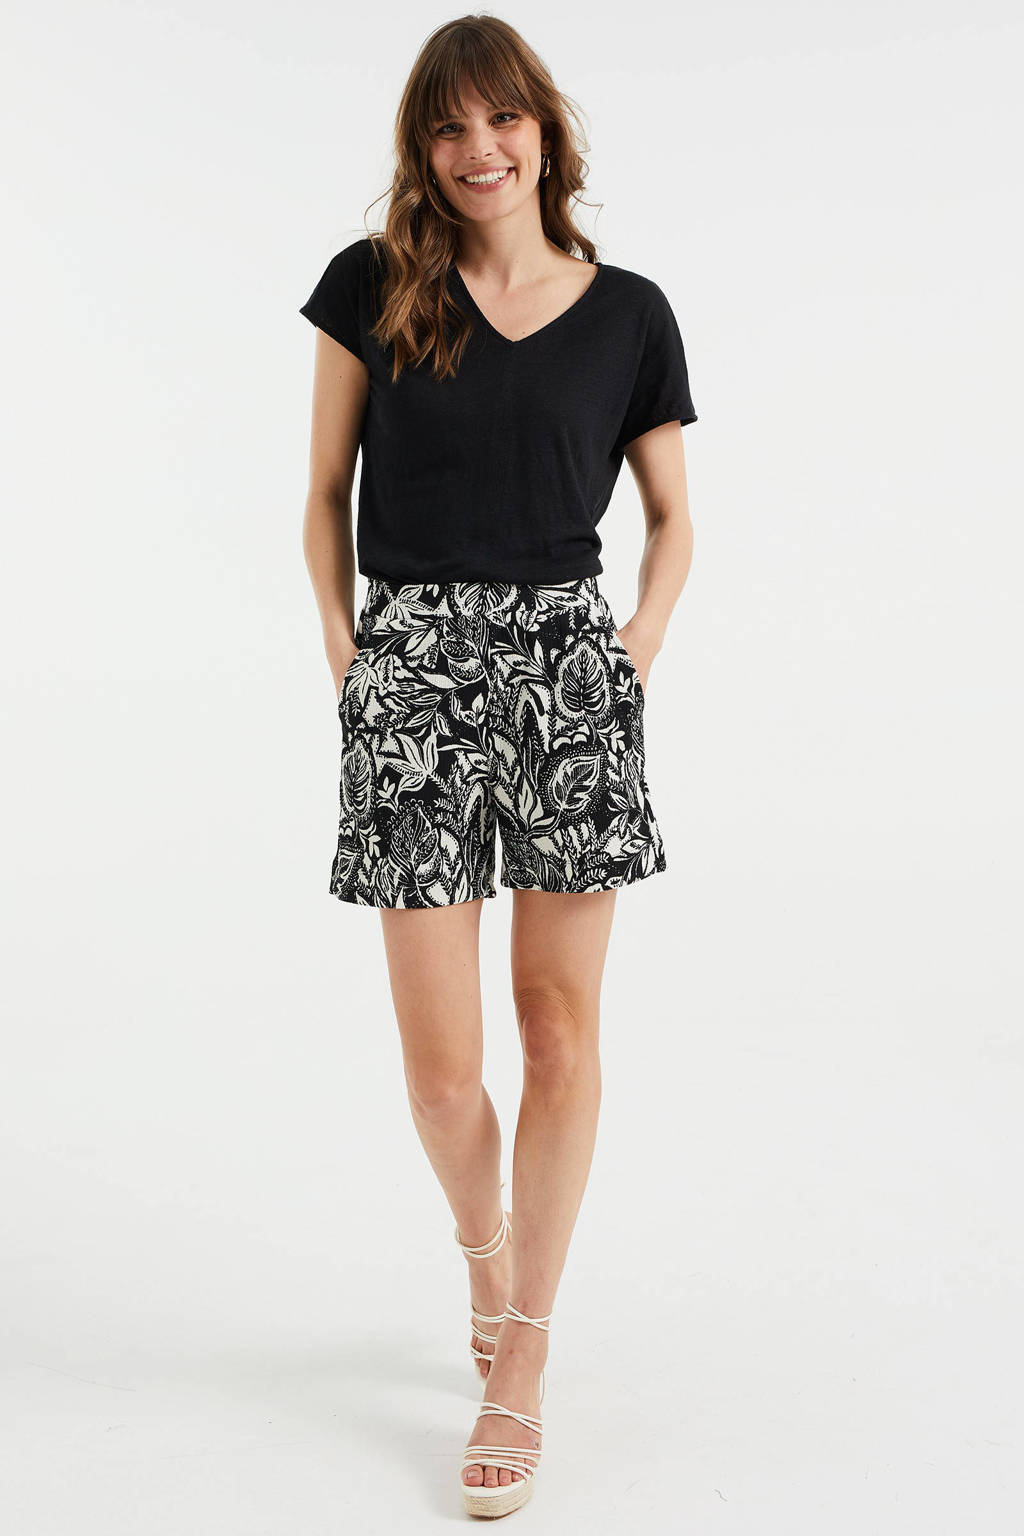 WE Fashion high waist straight fit short met all over print black dessin, Black Dessin